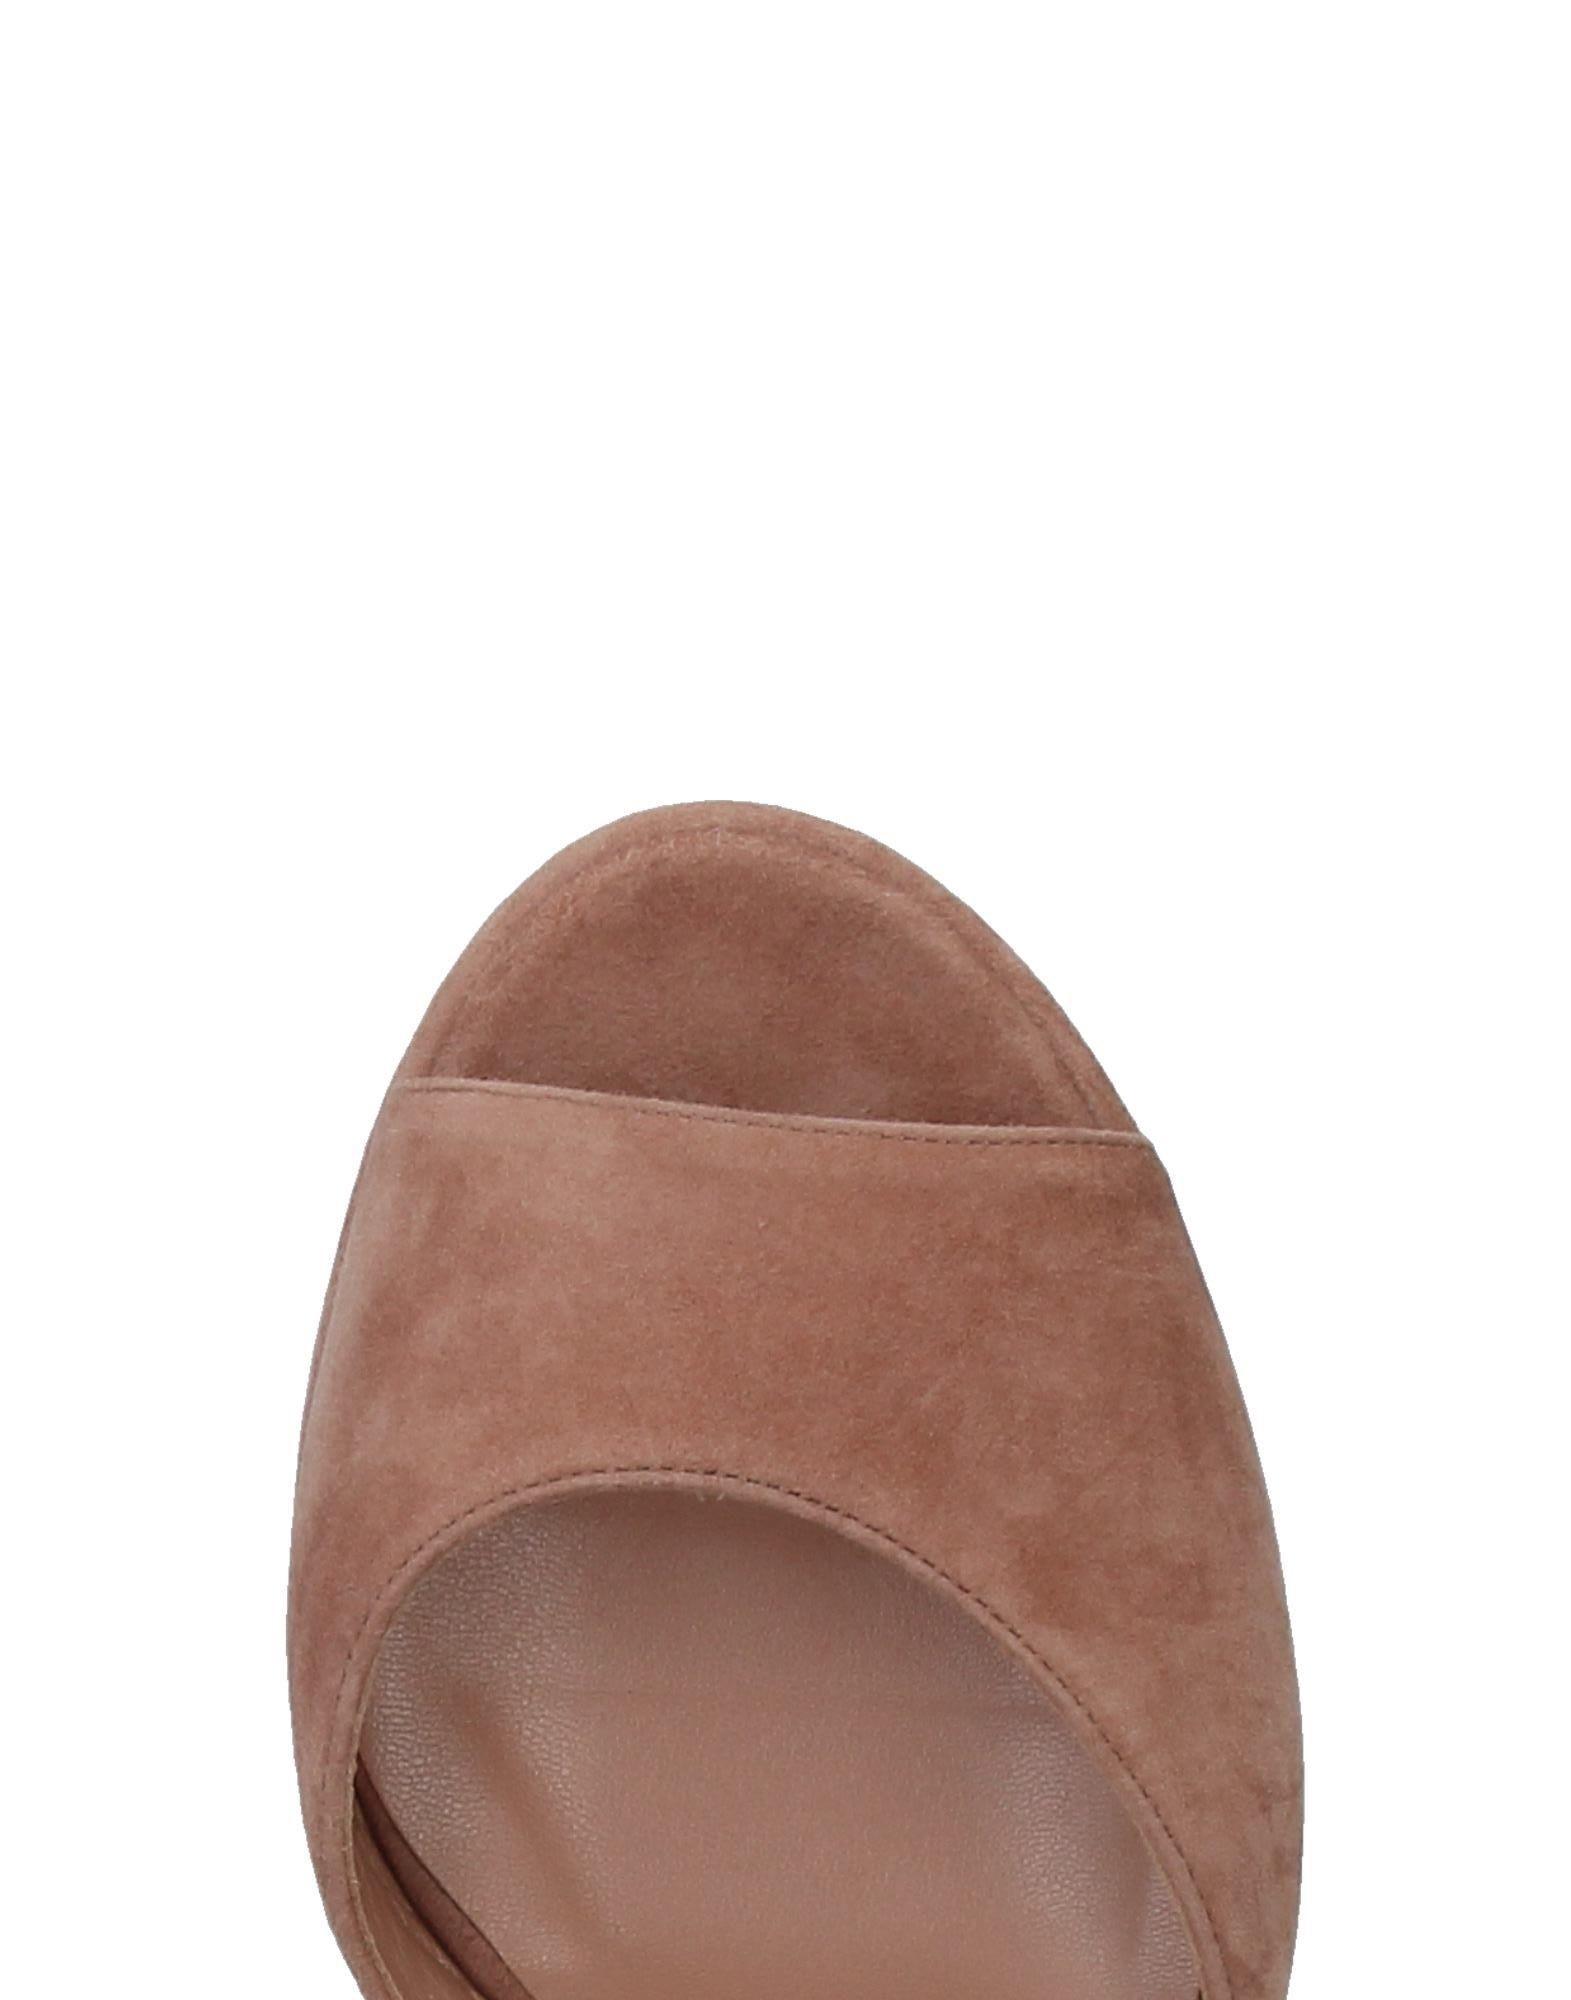 Haltbare Mode billige Schuhe Schuhe Twin 11368120TM Beliebte Schuhe billige b2cda5